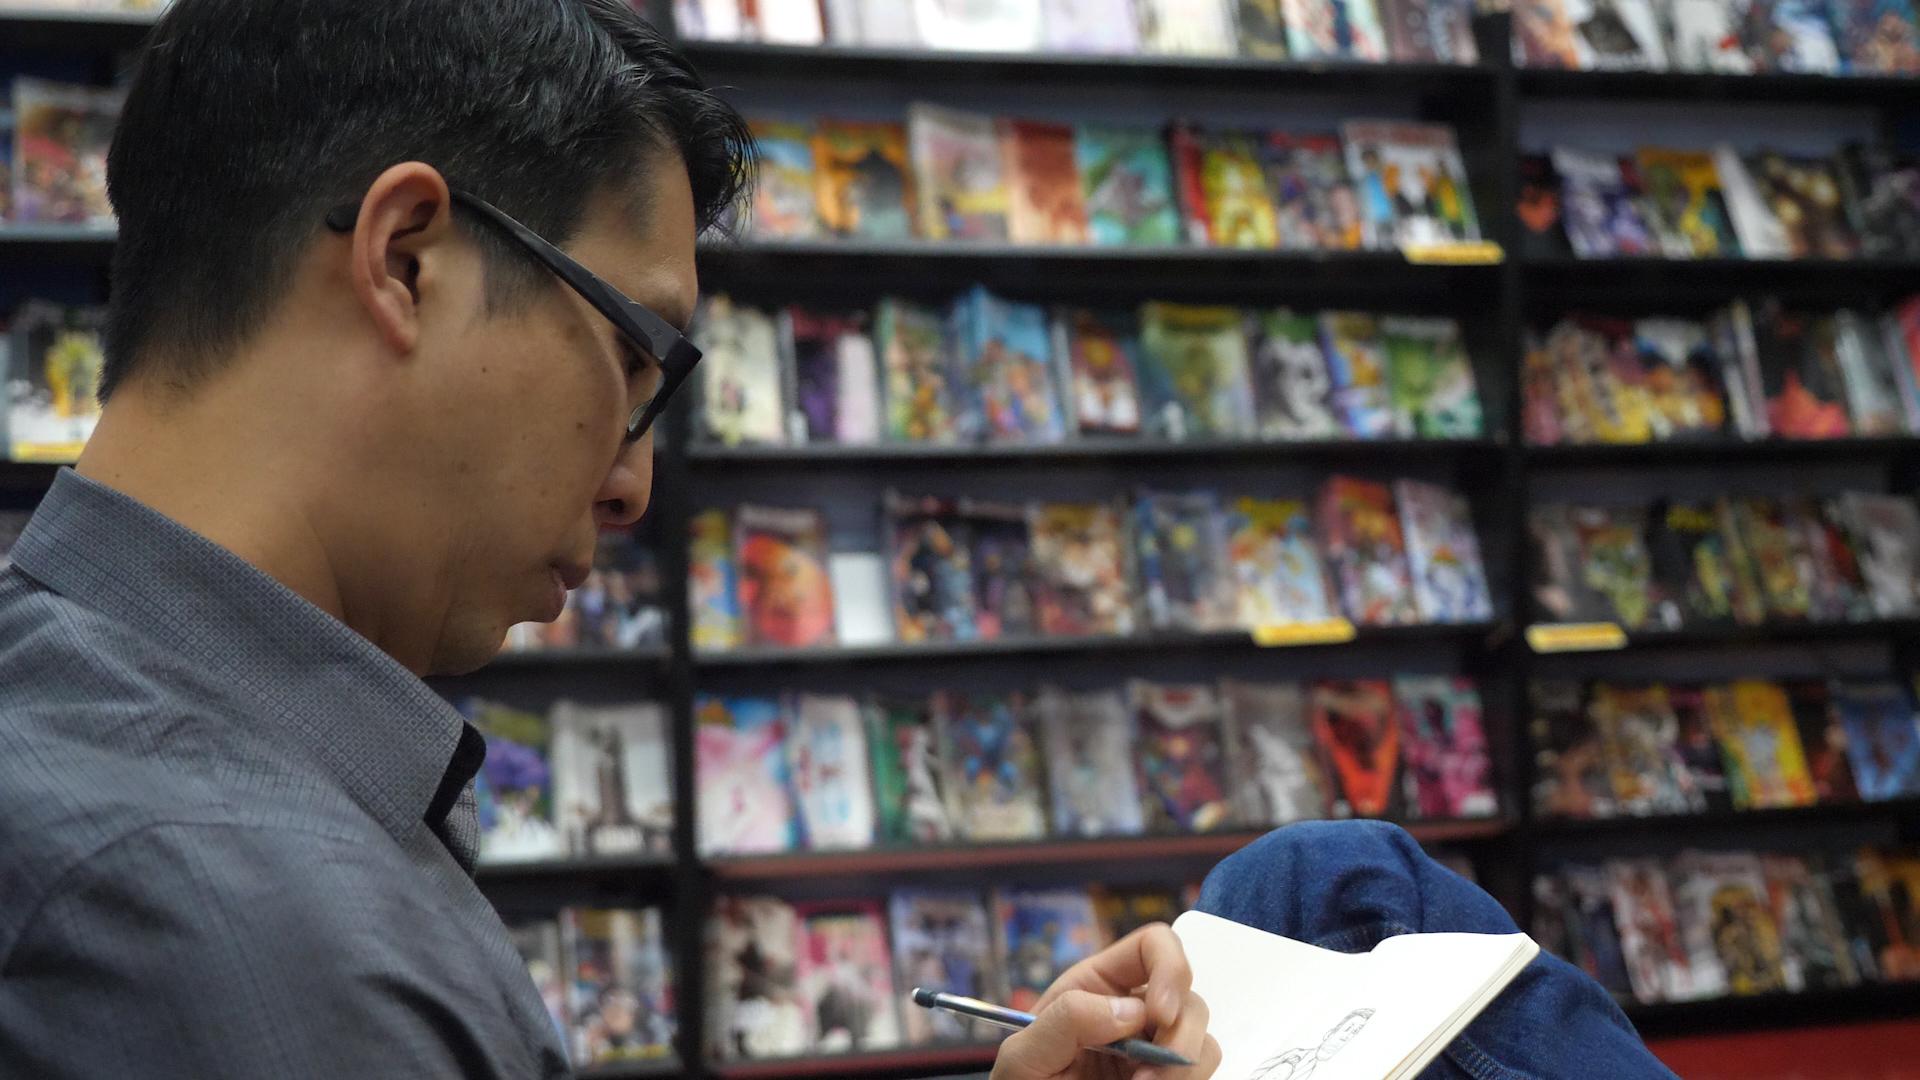 Gene Yang doodling in a comic book store.jpg